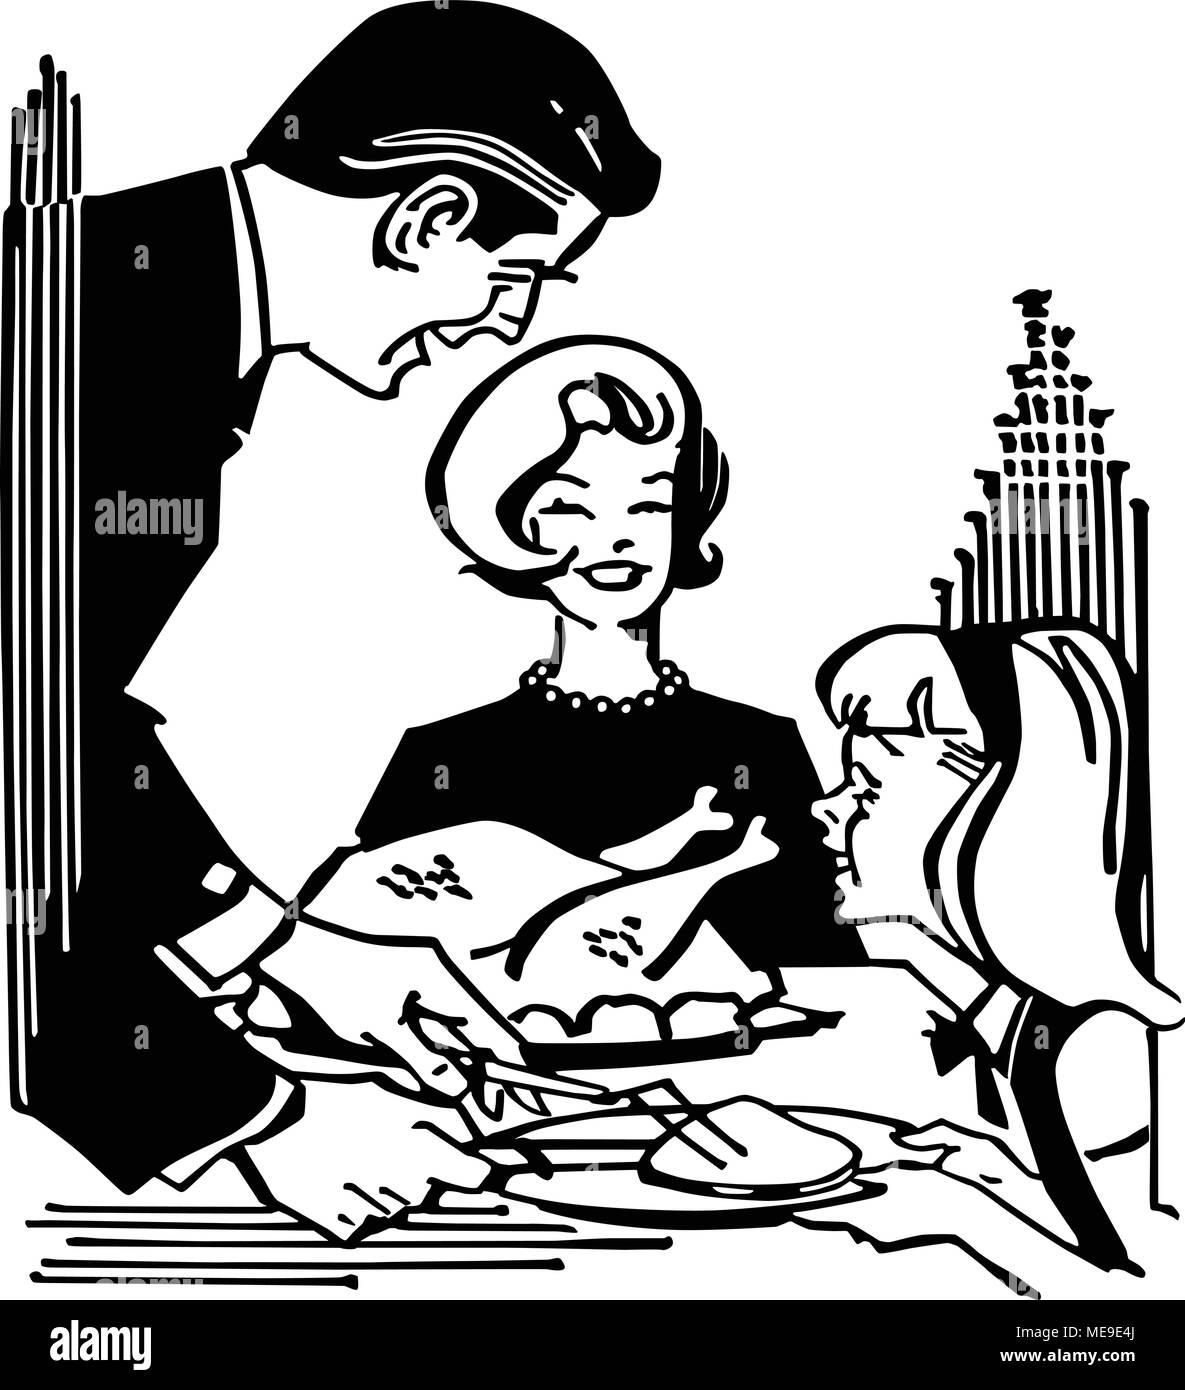 Dad Serving Turkey - Retro Clipart Illustration - Stock Image